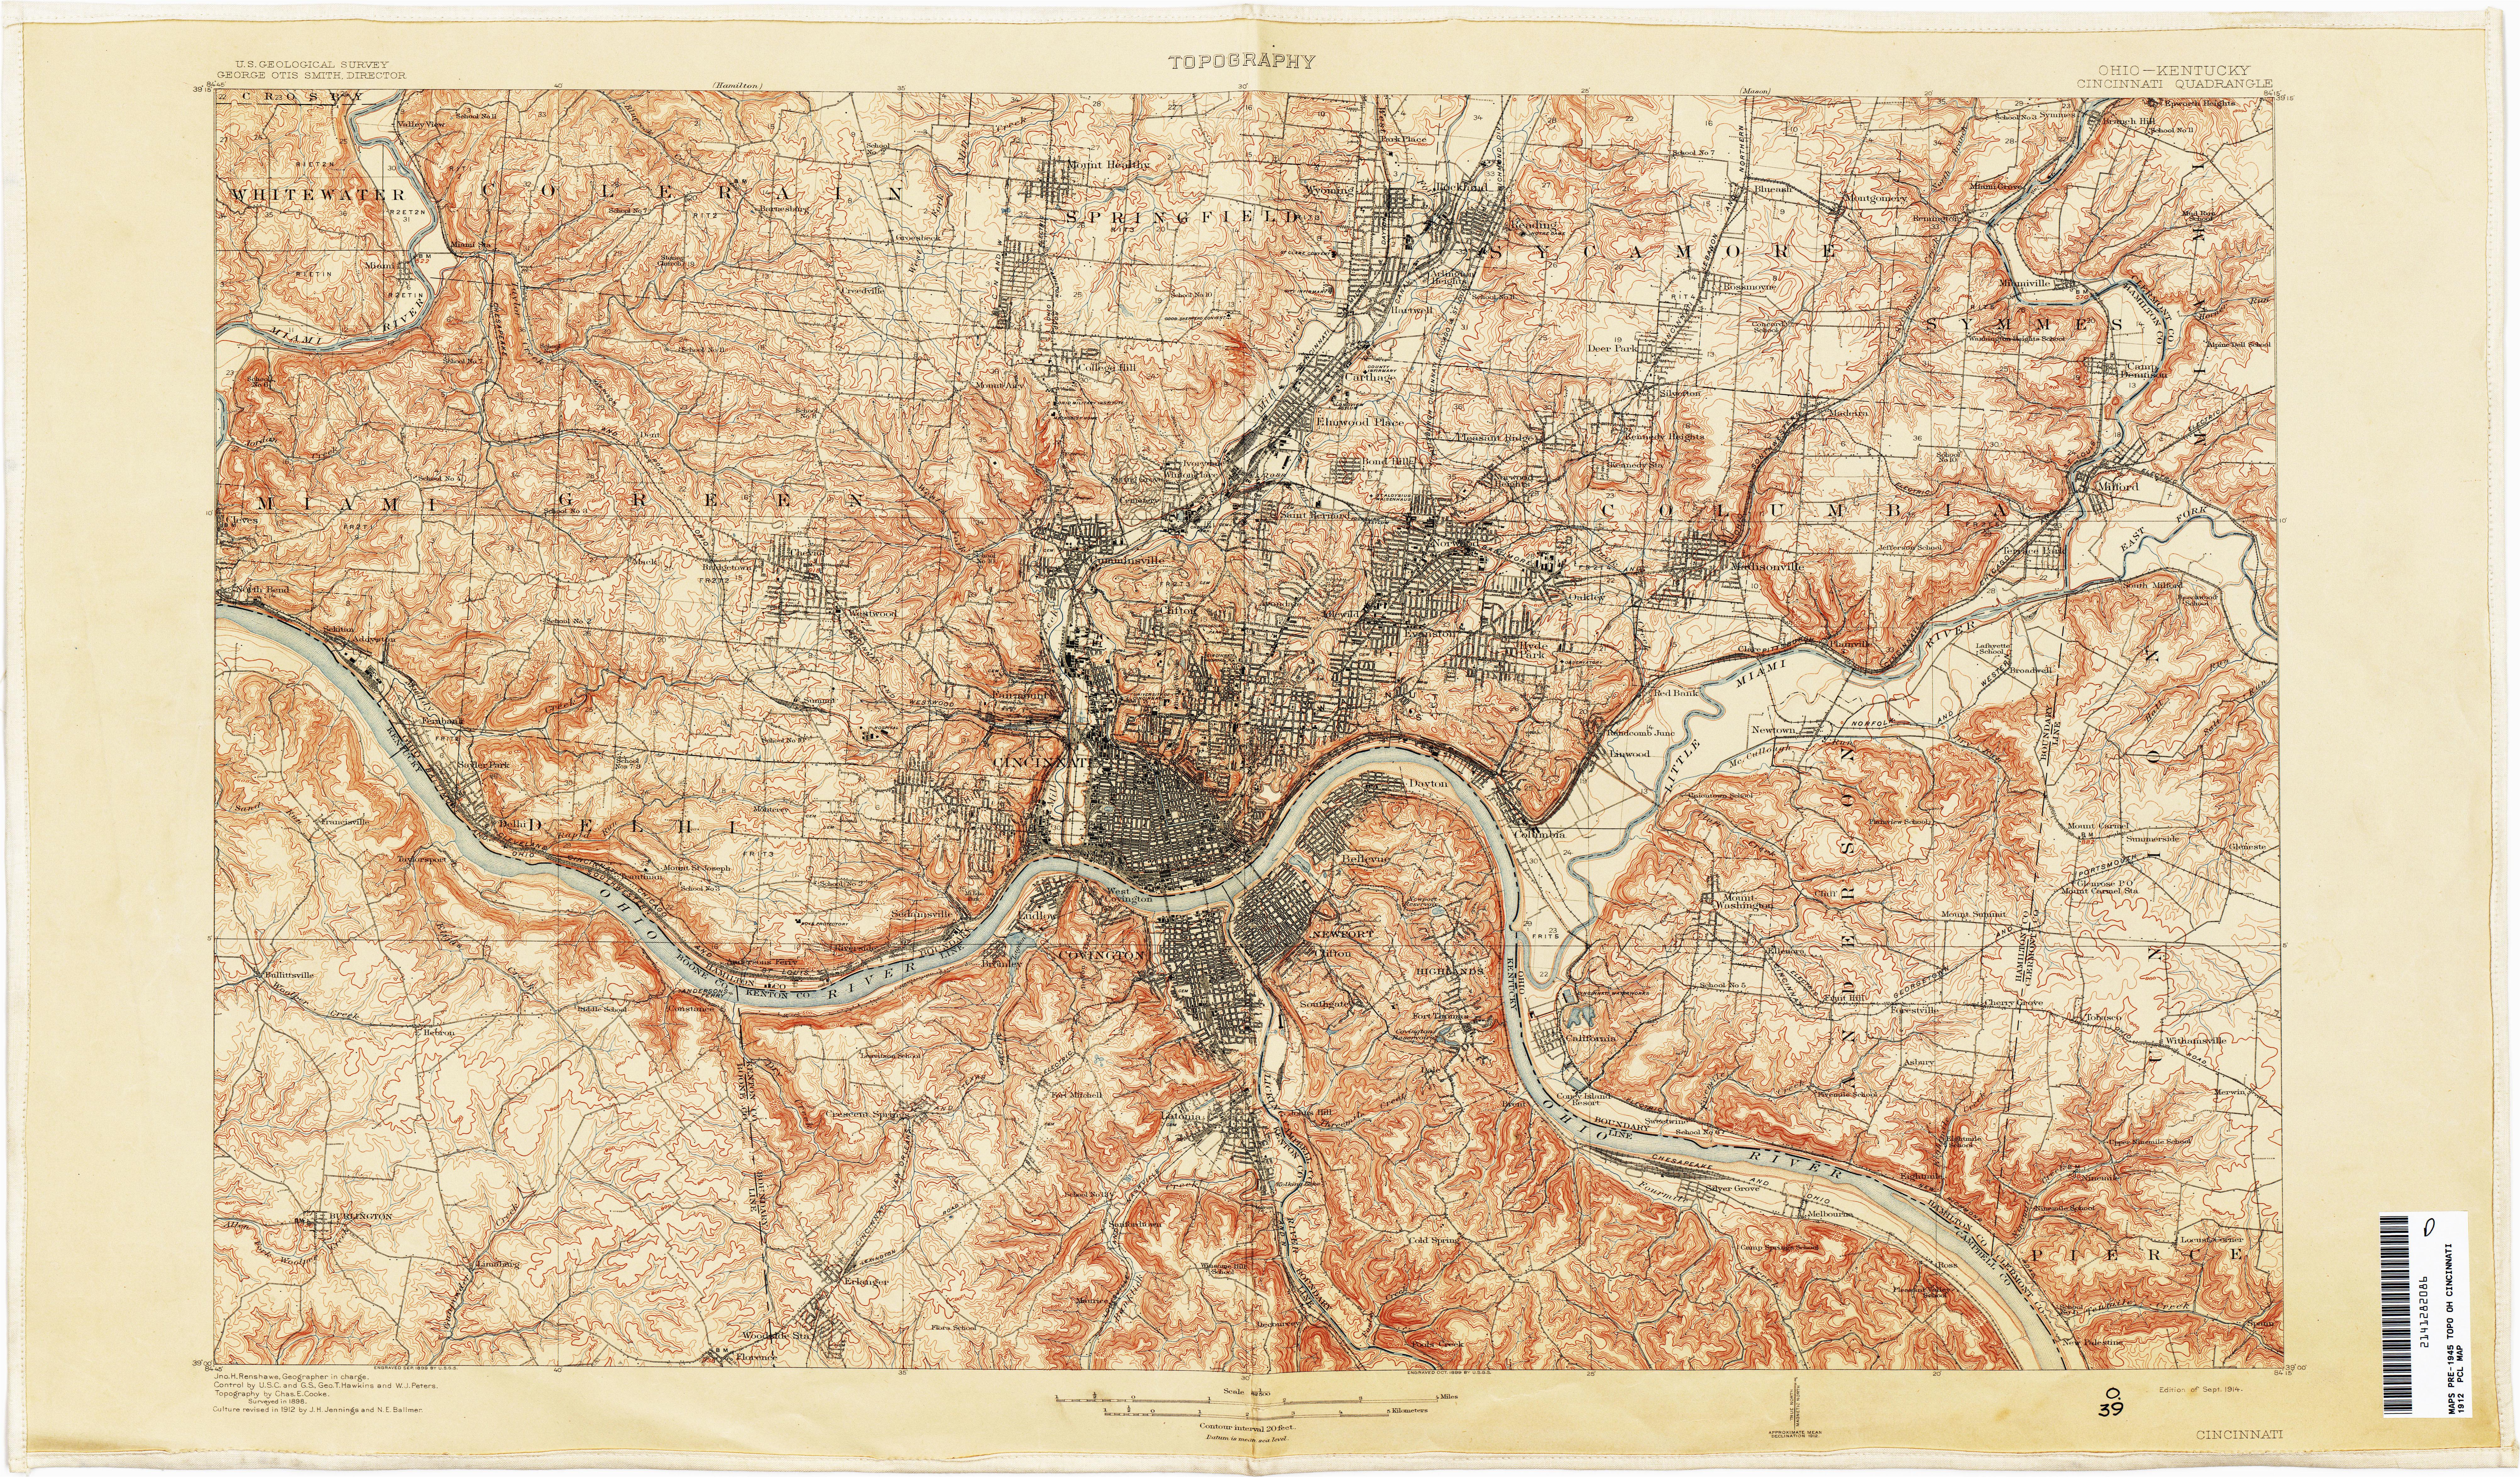 Dayton Ohio Google Maps Ohio Historical topographic Maps Perry ... on